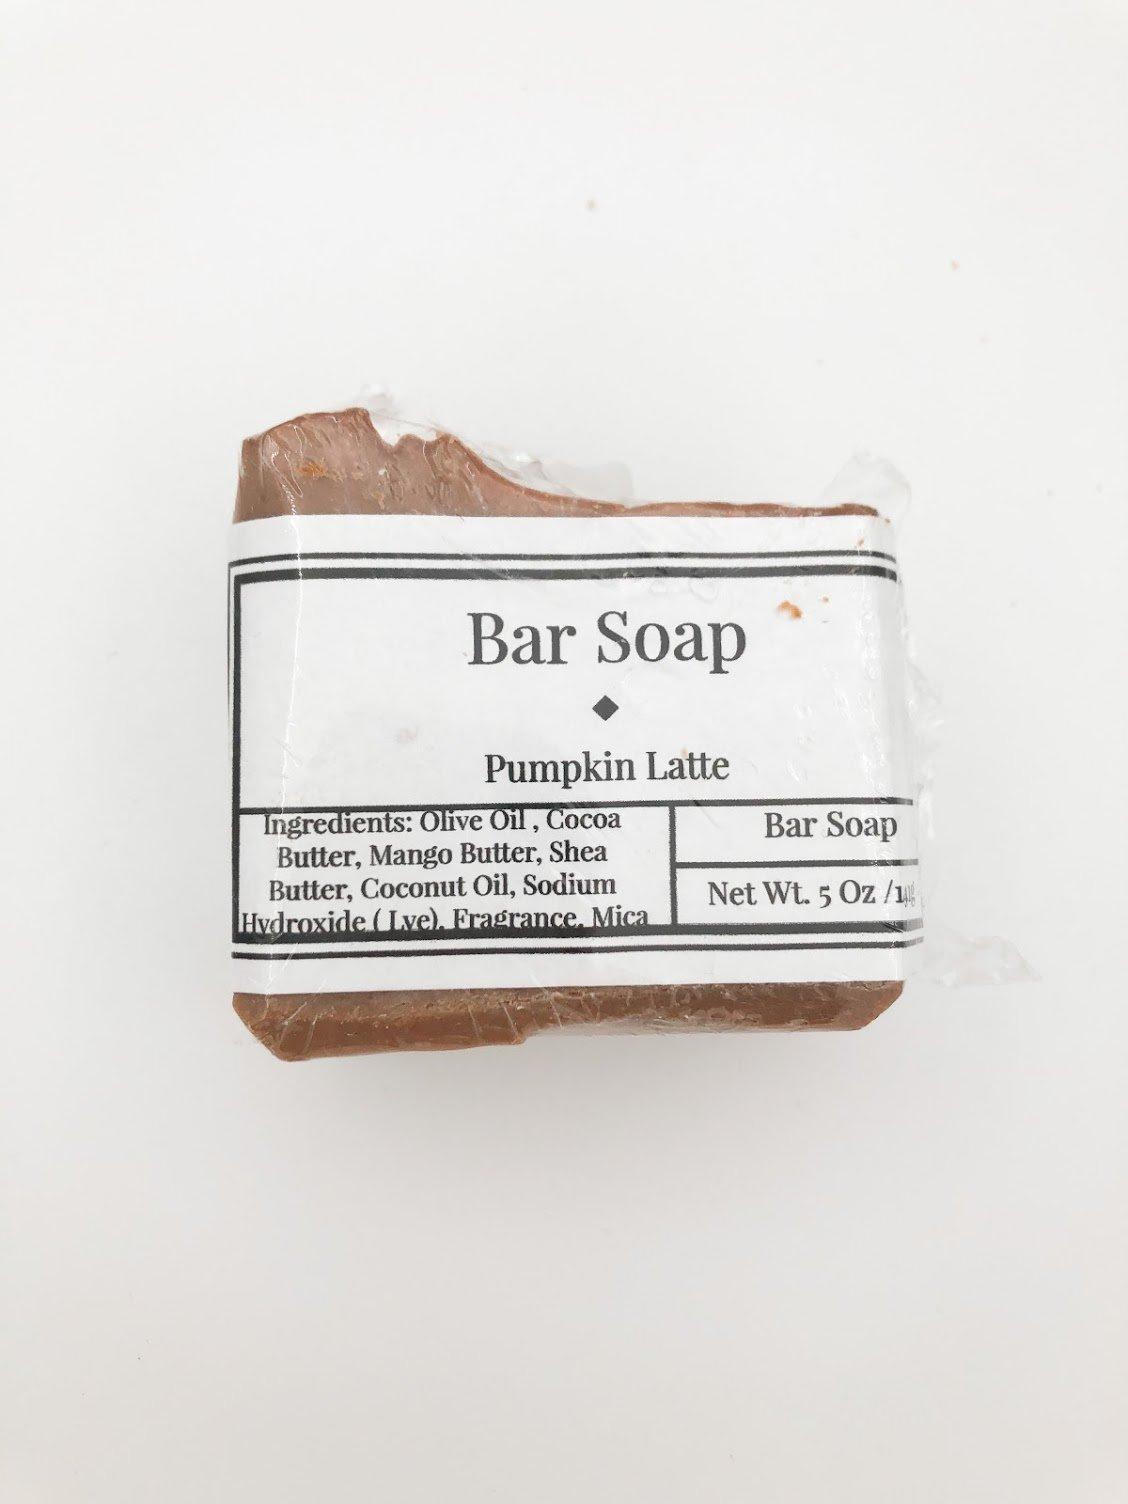 Bar Soap - Pumpkin Latte